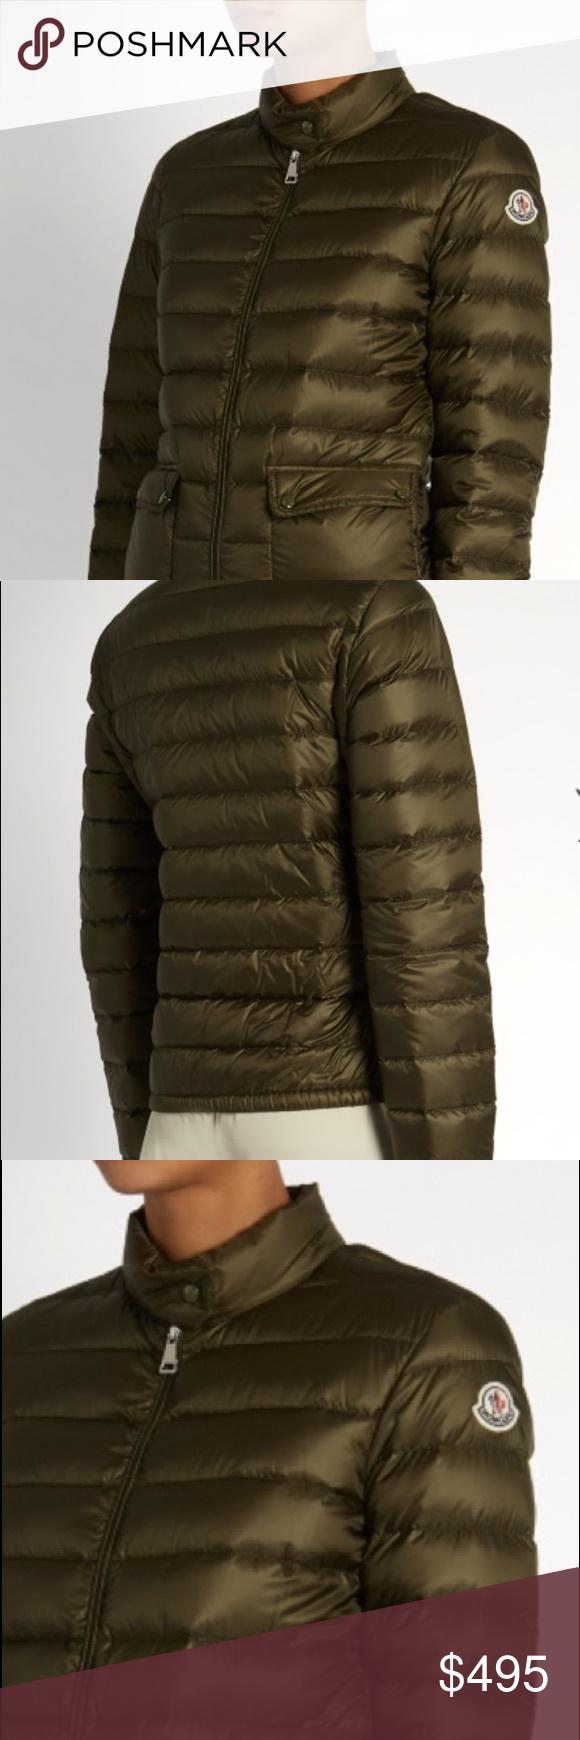 "Moncler ""Lans"" Jacket - Khaki Green Moncler Khaki Green ""Lans"" jacket."